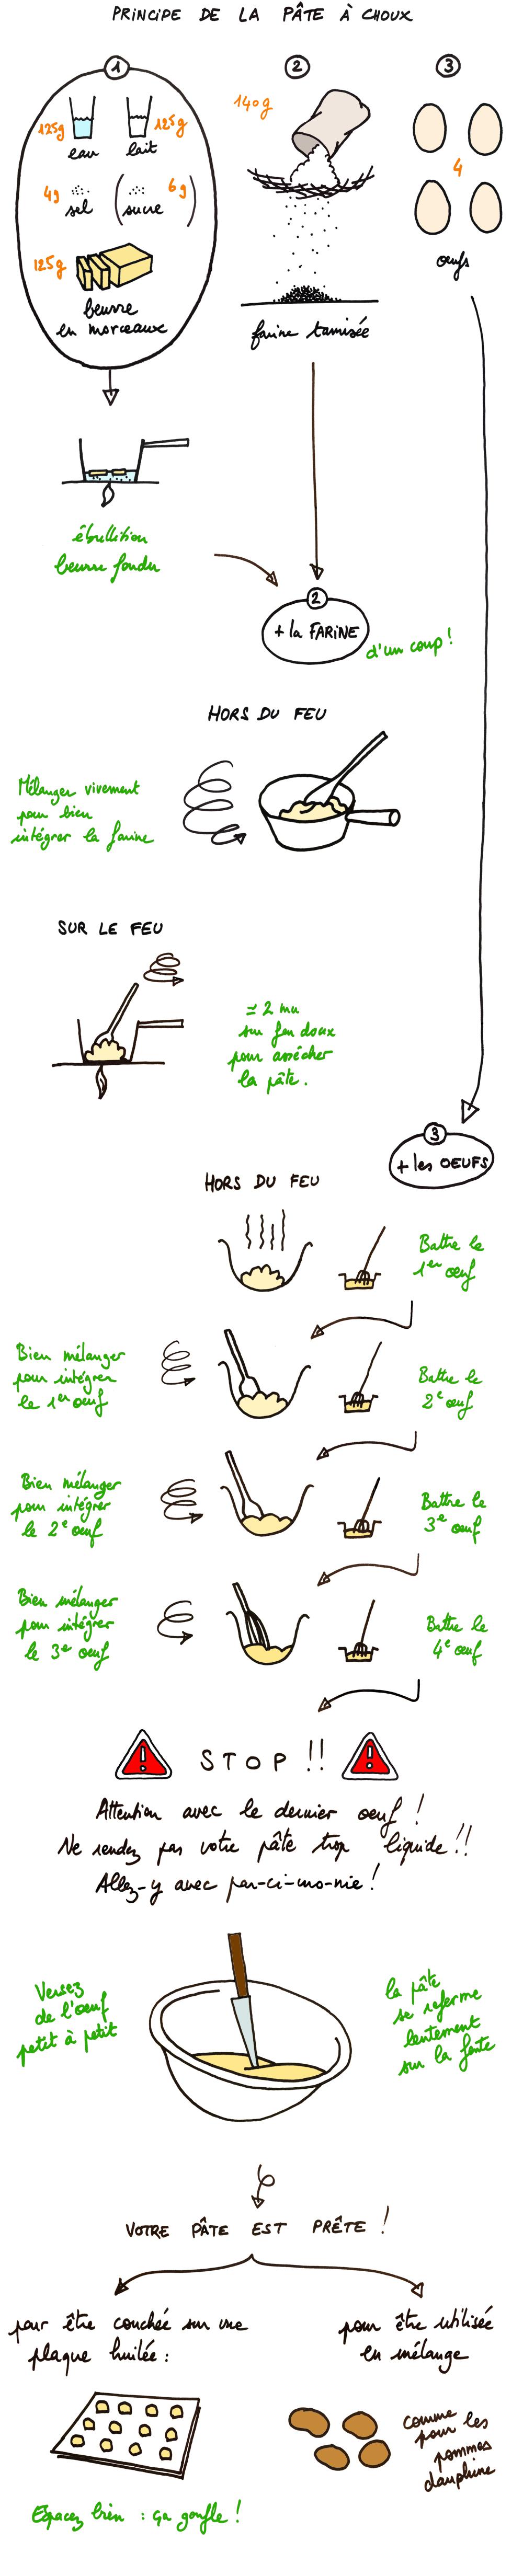 pâte à choux : le principe